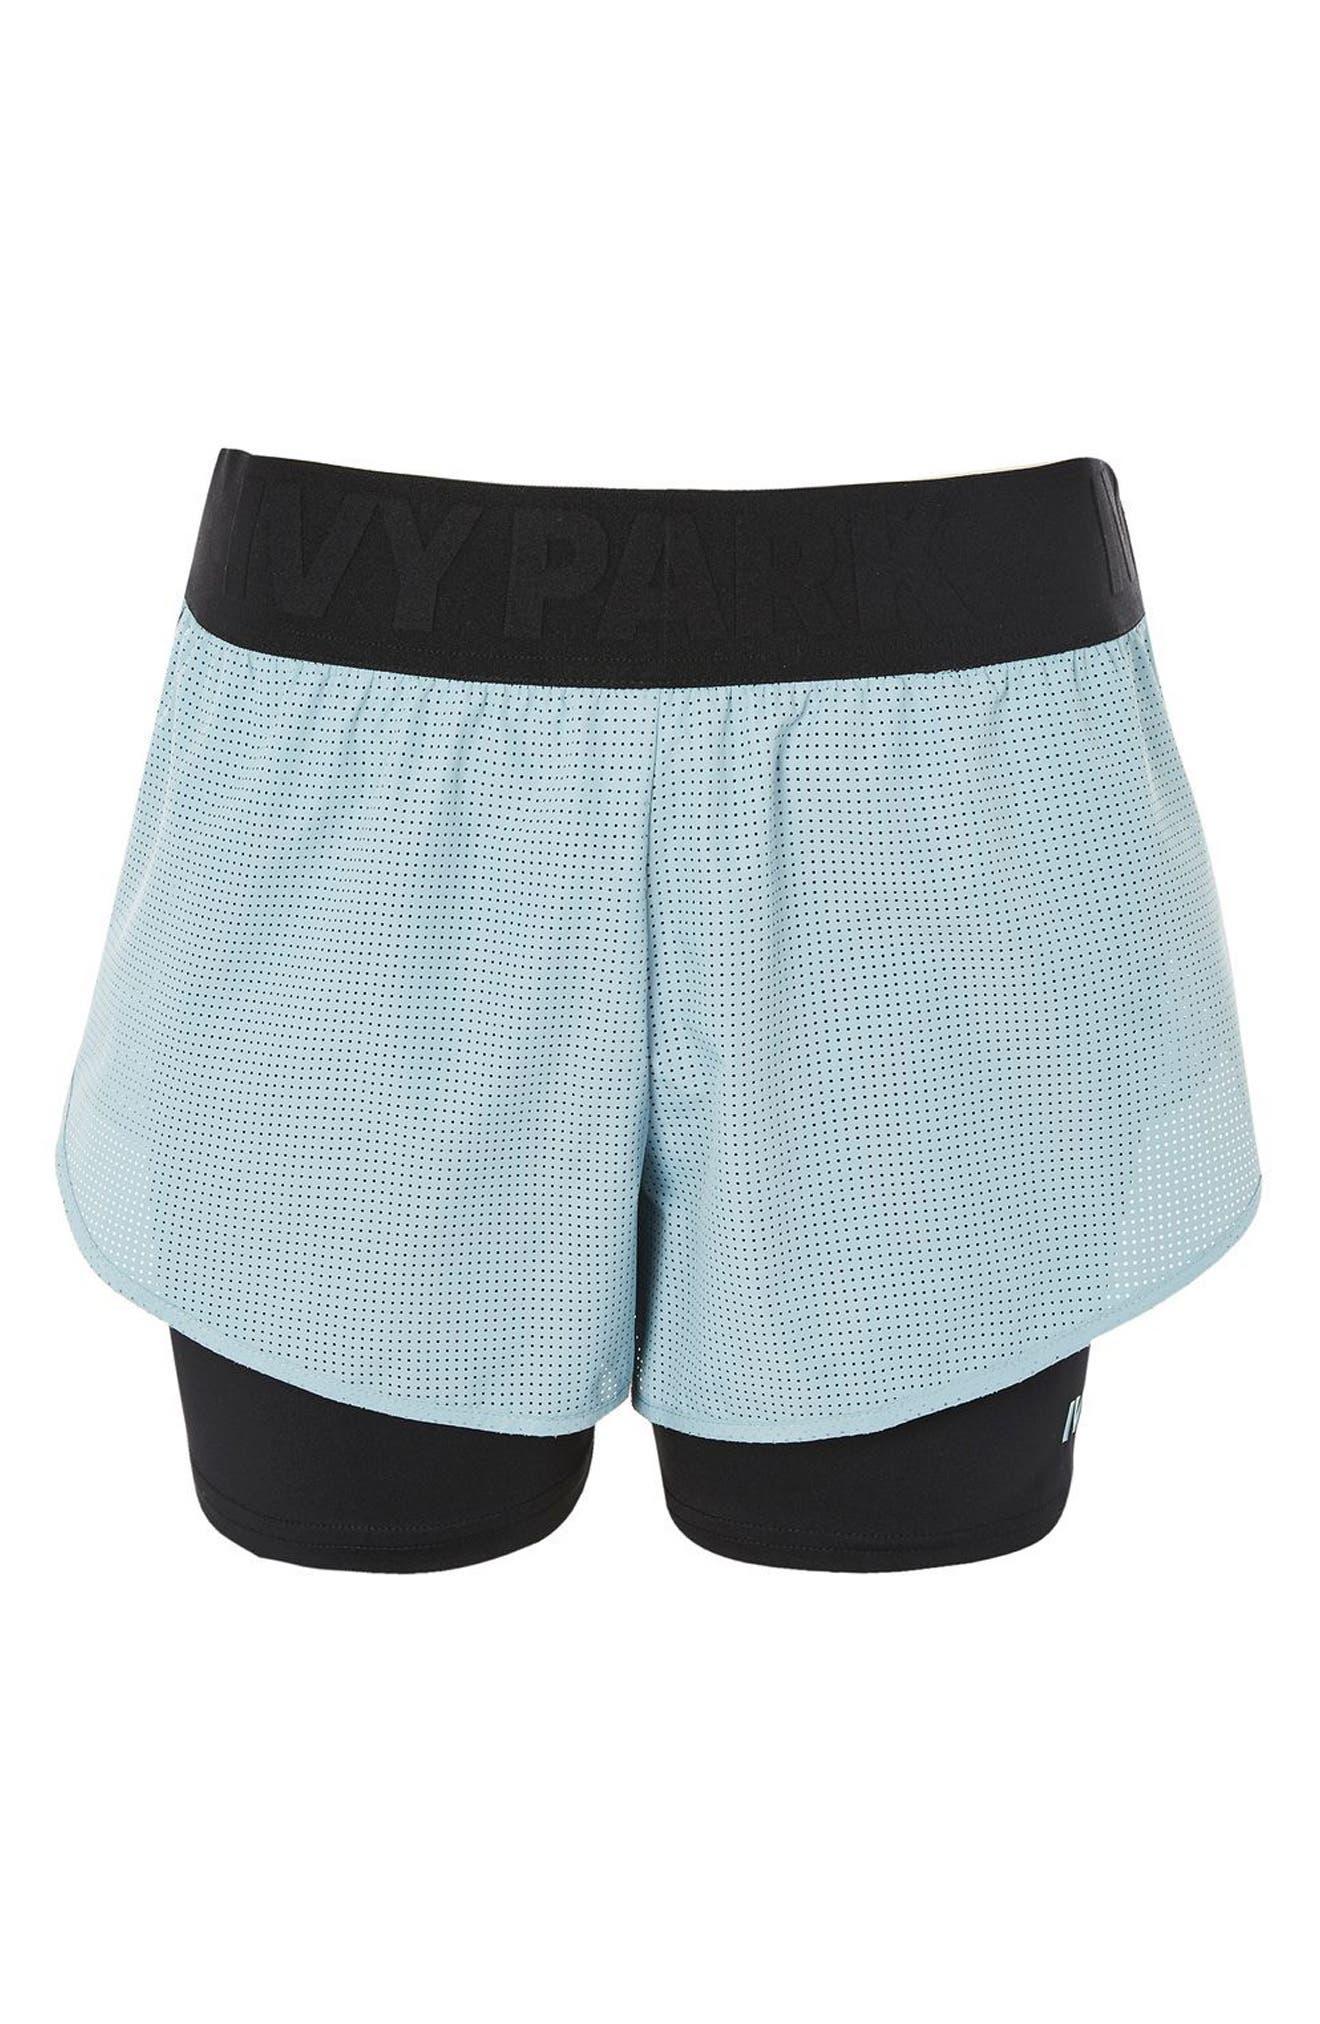 Perforated 2-in-1 Runner Shorts,                             Alternate thumbnail 4, color,                             Porcelain Blue